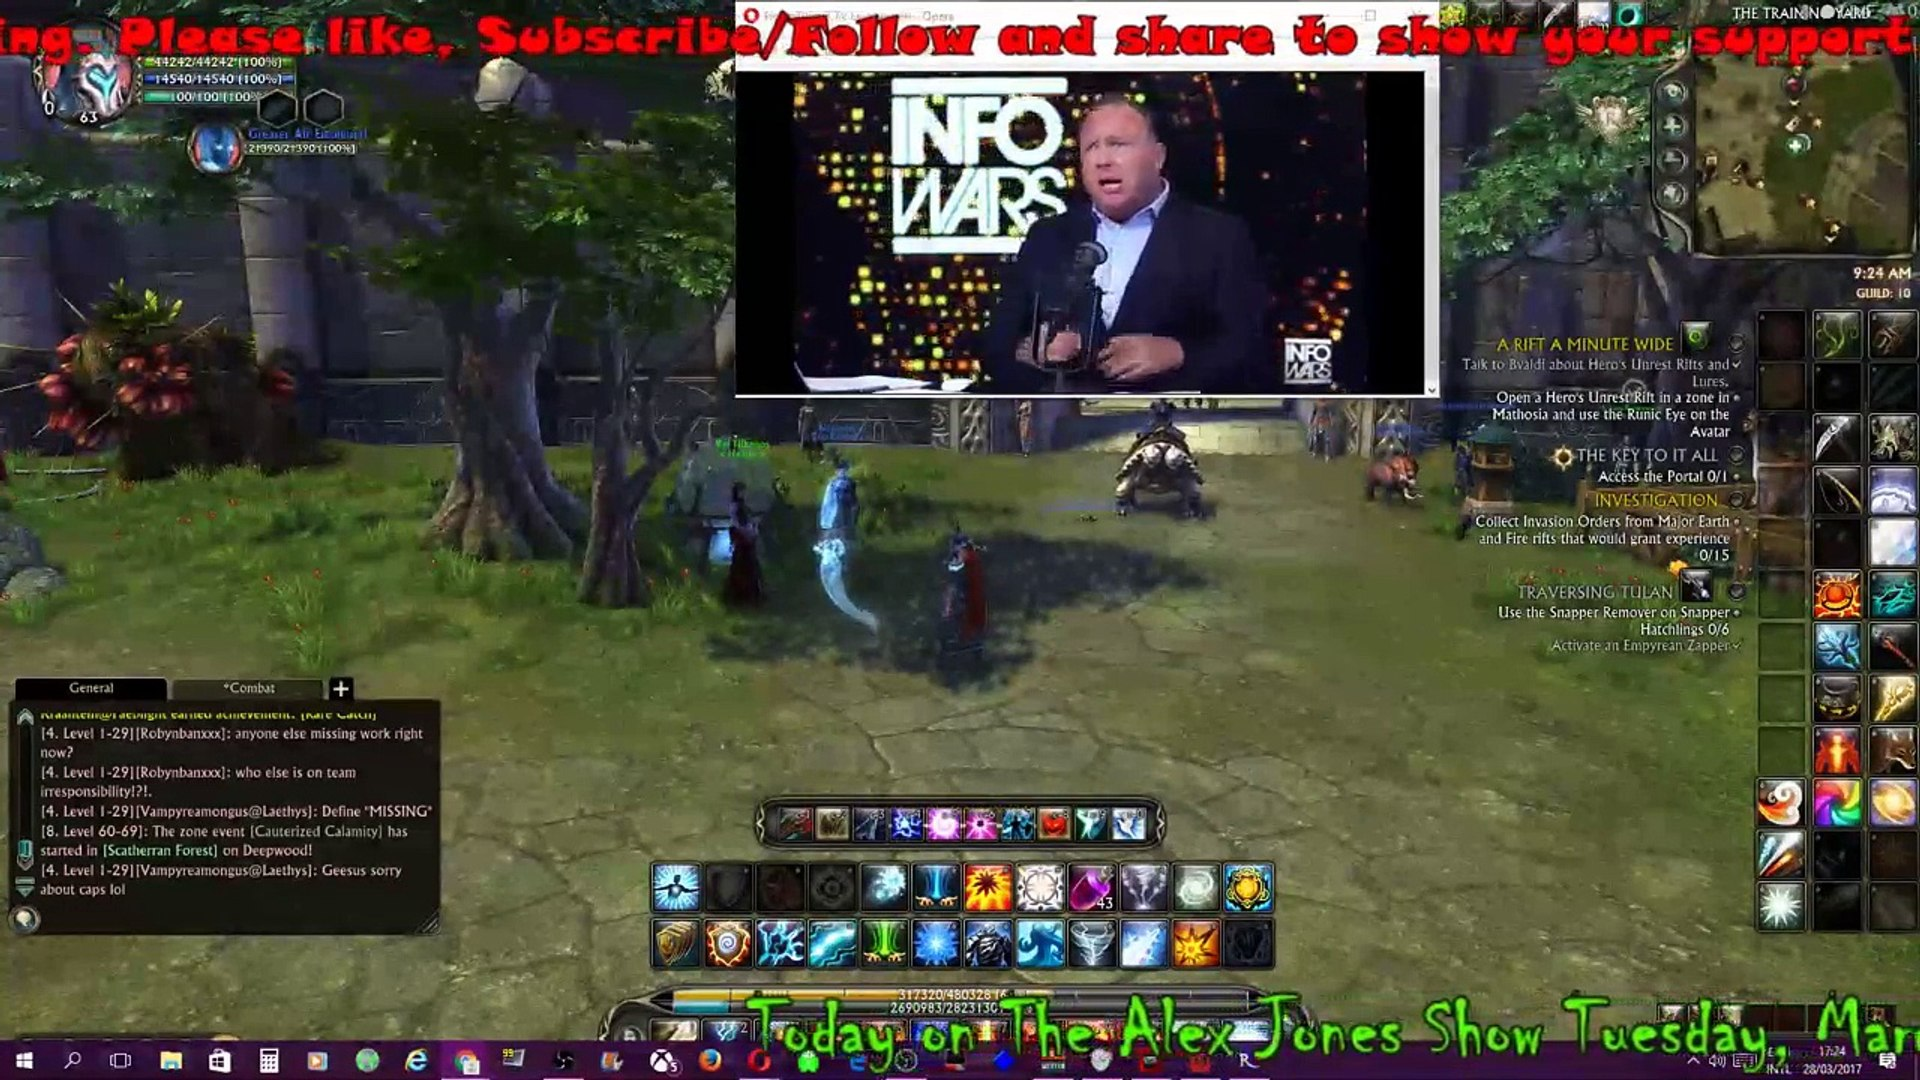 Rift Starfall Prophecy with INFOWARS Audio 03-28-2017 LIVE STREAM LINK infowars.com/show (11)